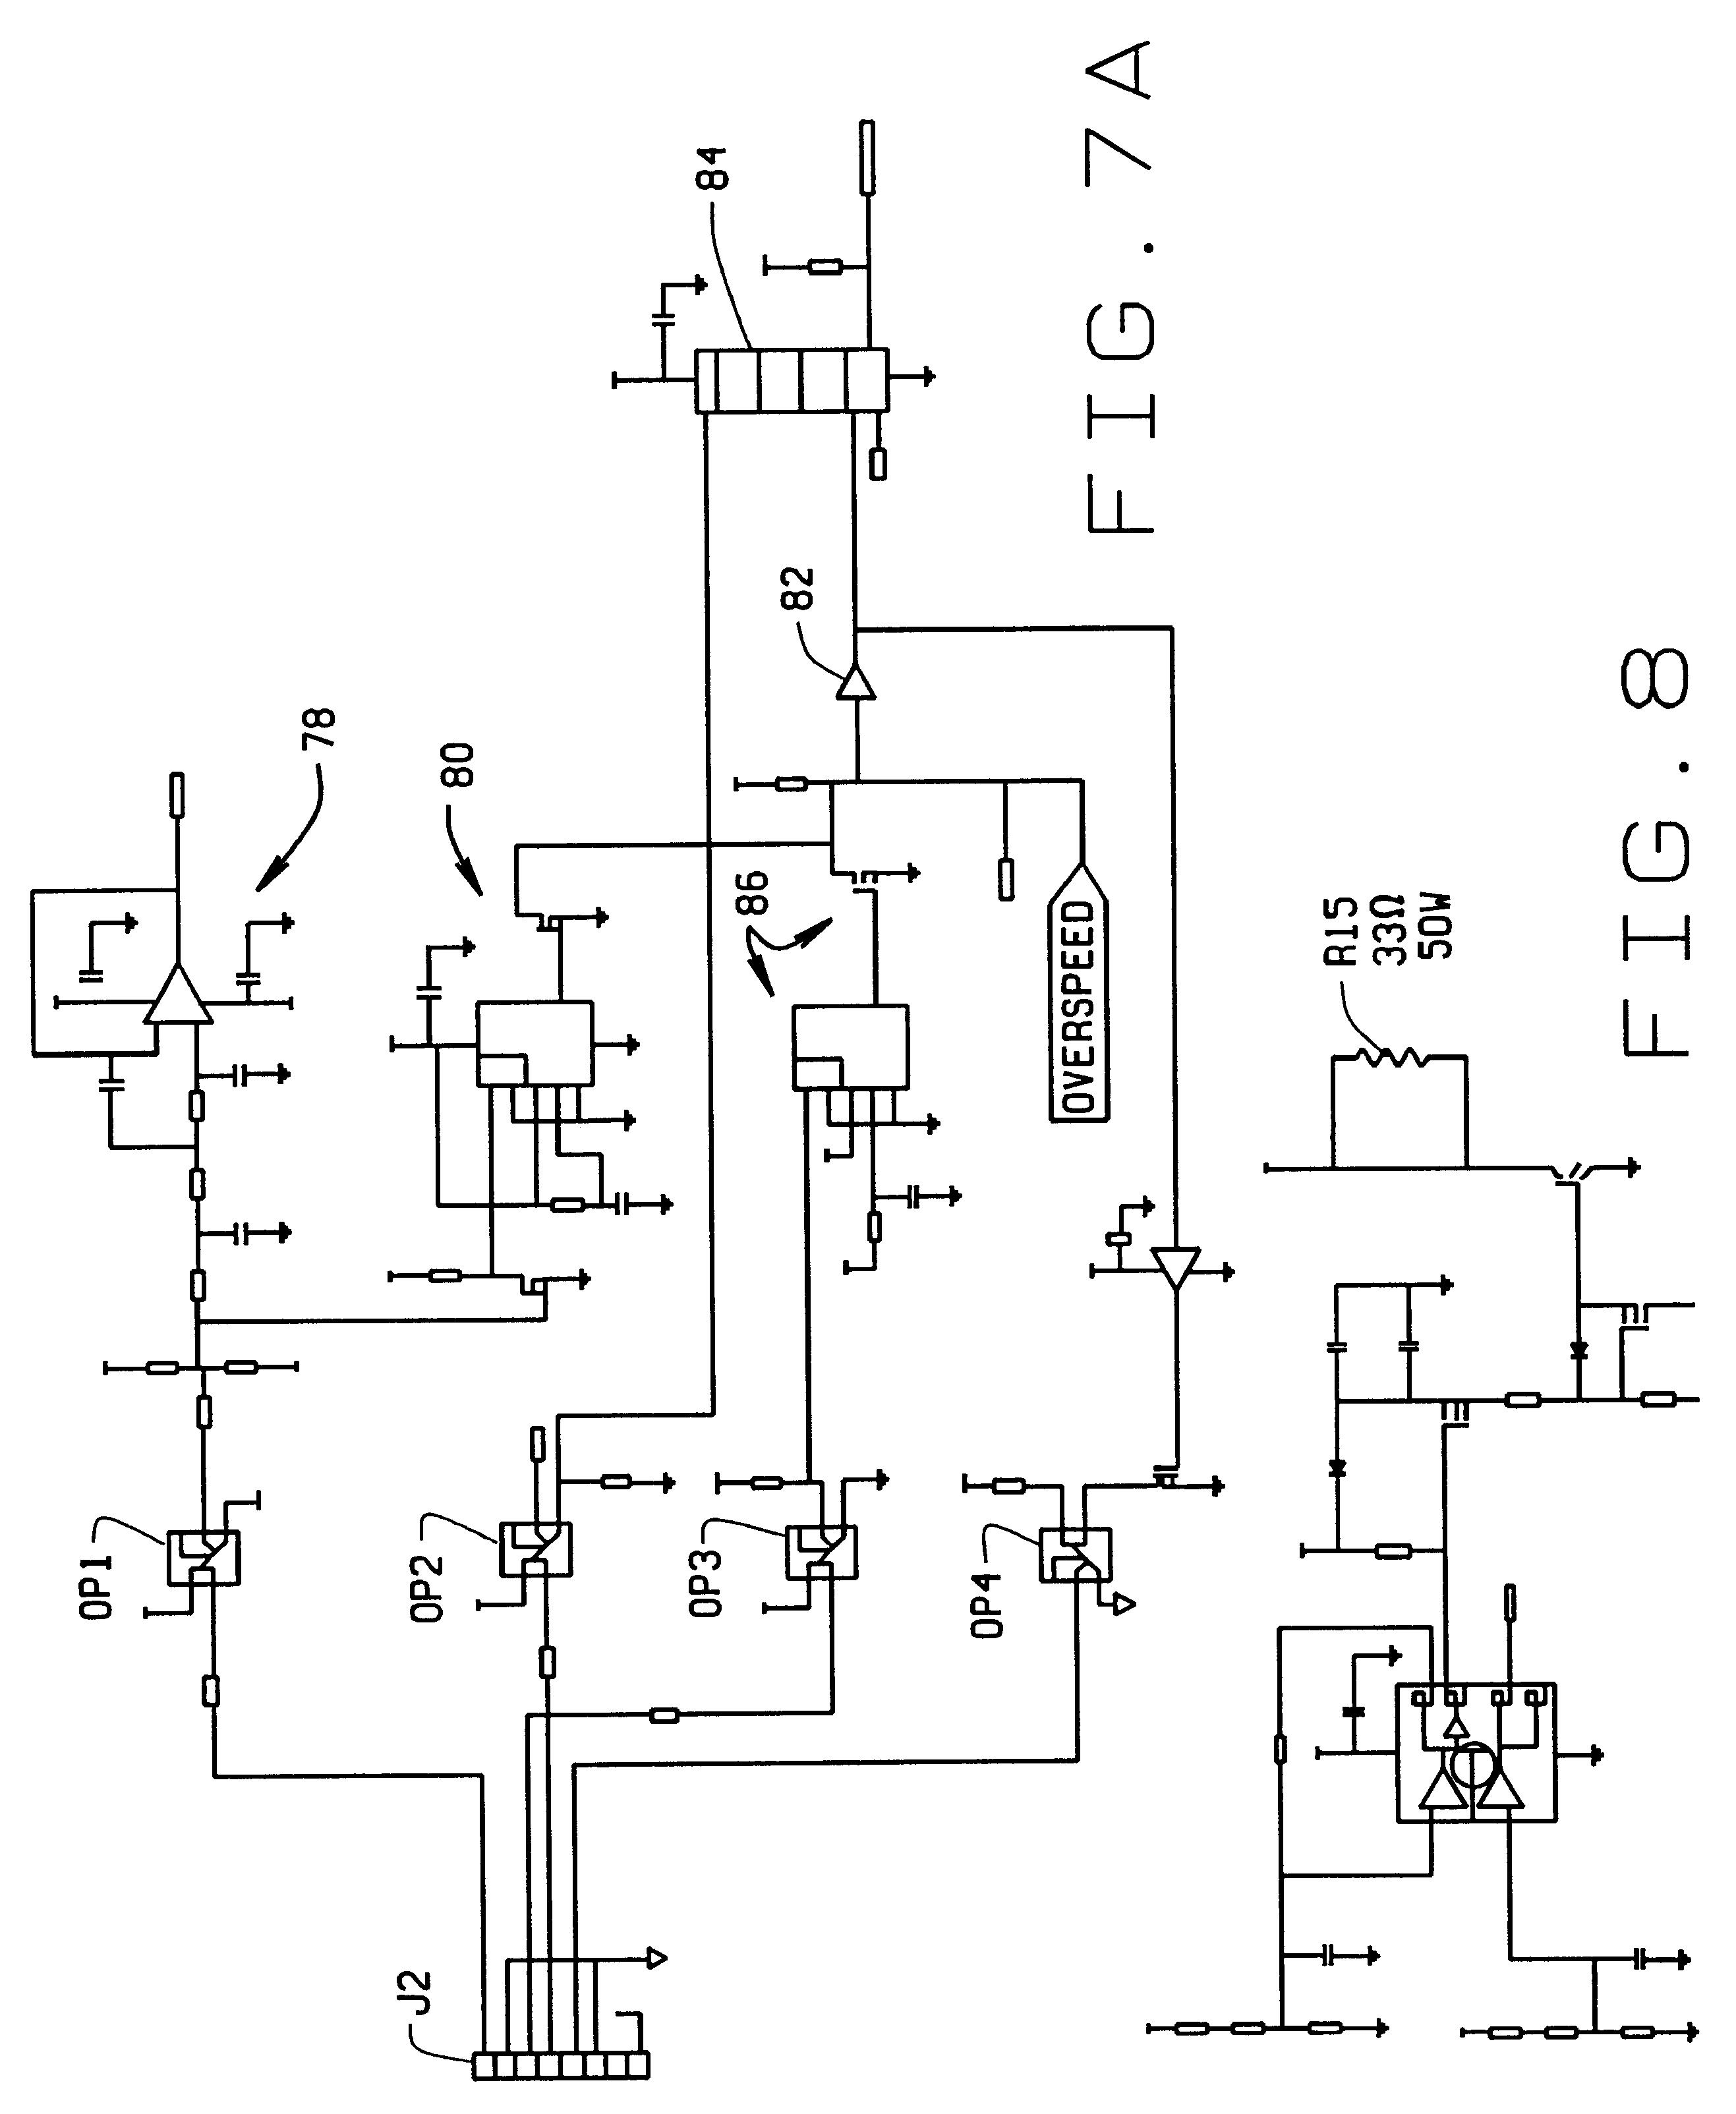 Happijac Wiring Diagram | Wiring Liry on